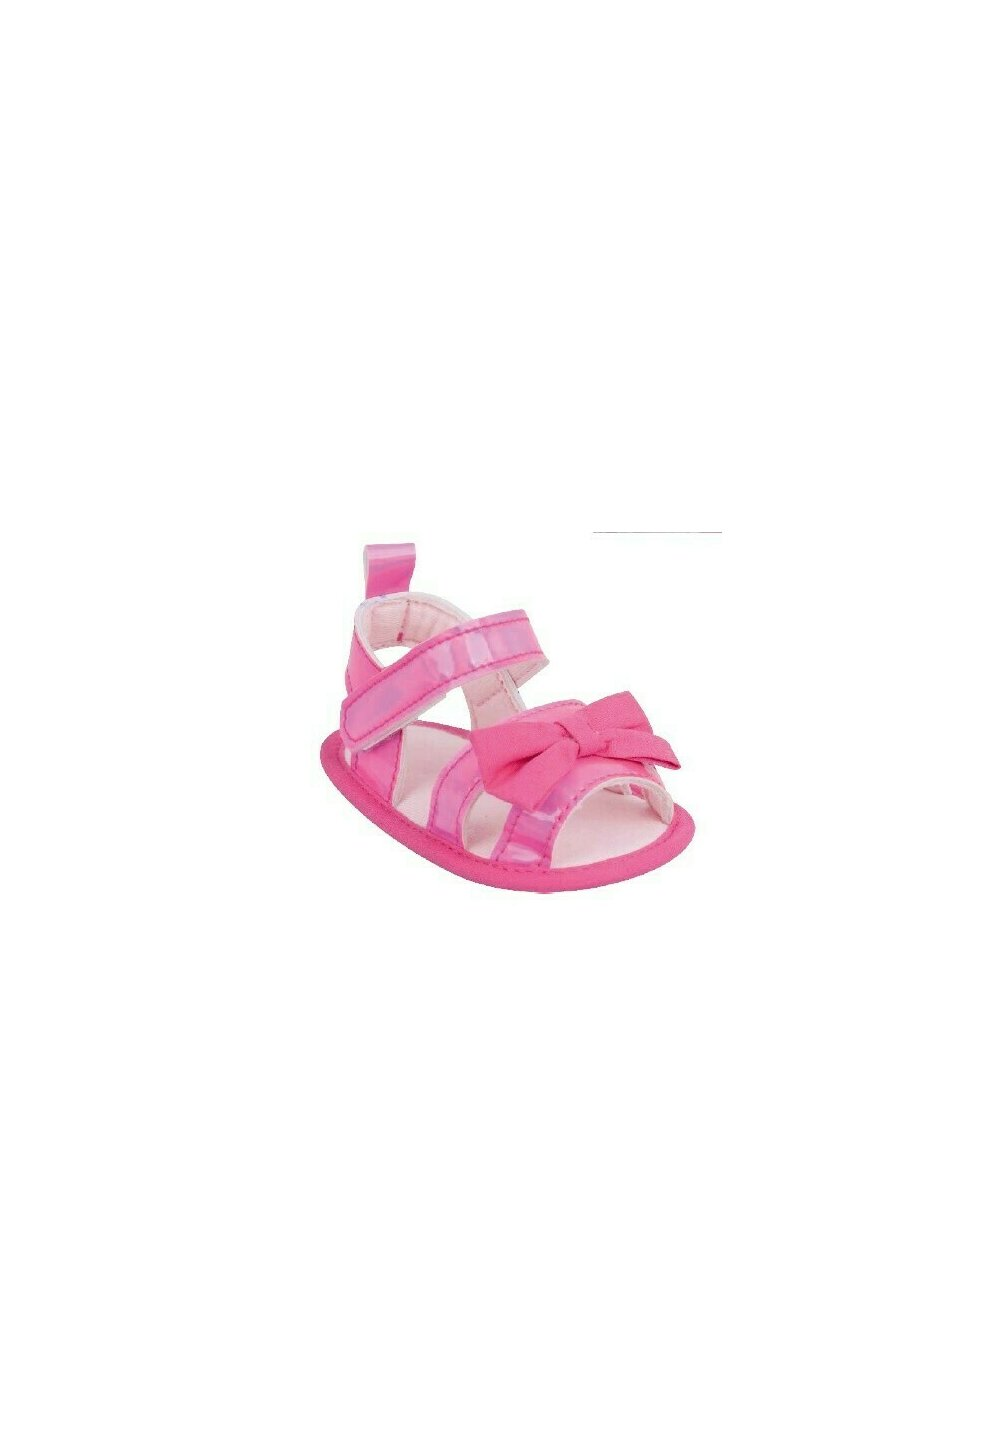 Sandale bebe, roz cu fundita imagine